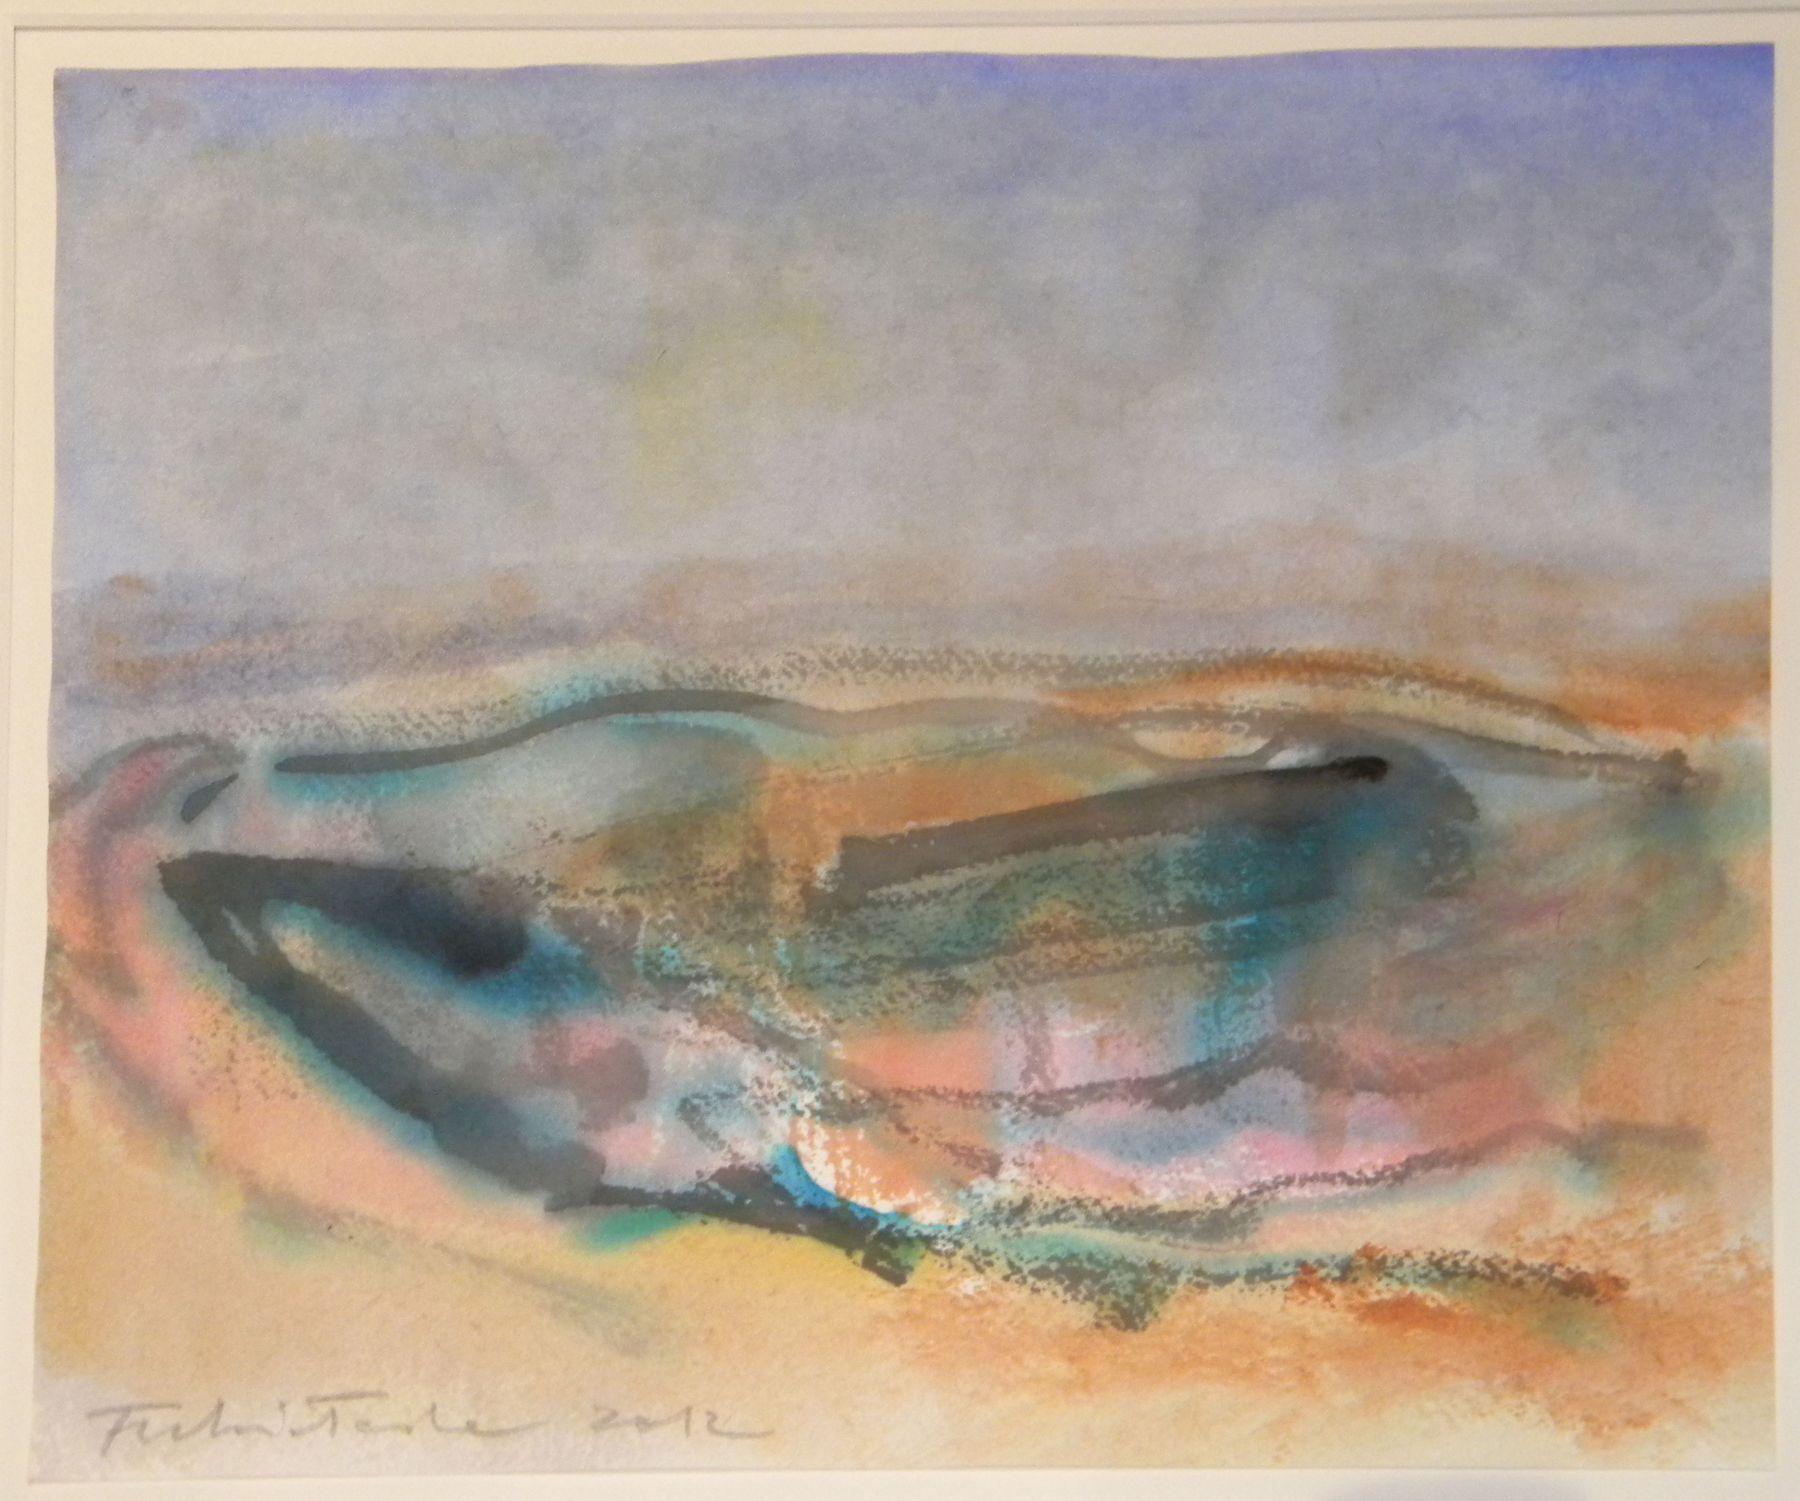 Fulvio Testa, Untitled 24, 2012    Watercolor on paper 9 3/4 x 11 3/4 inches